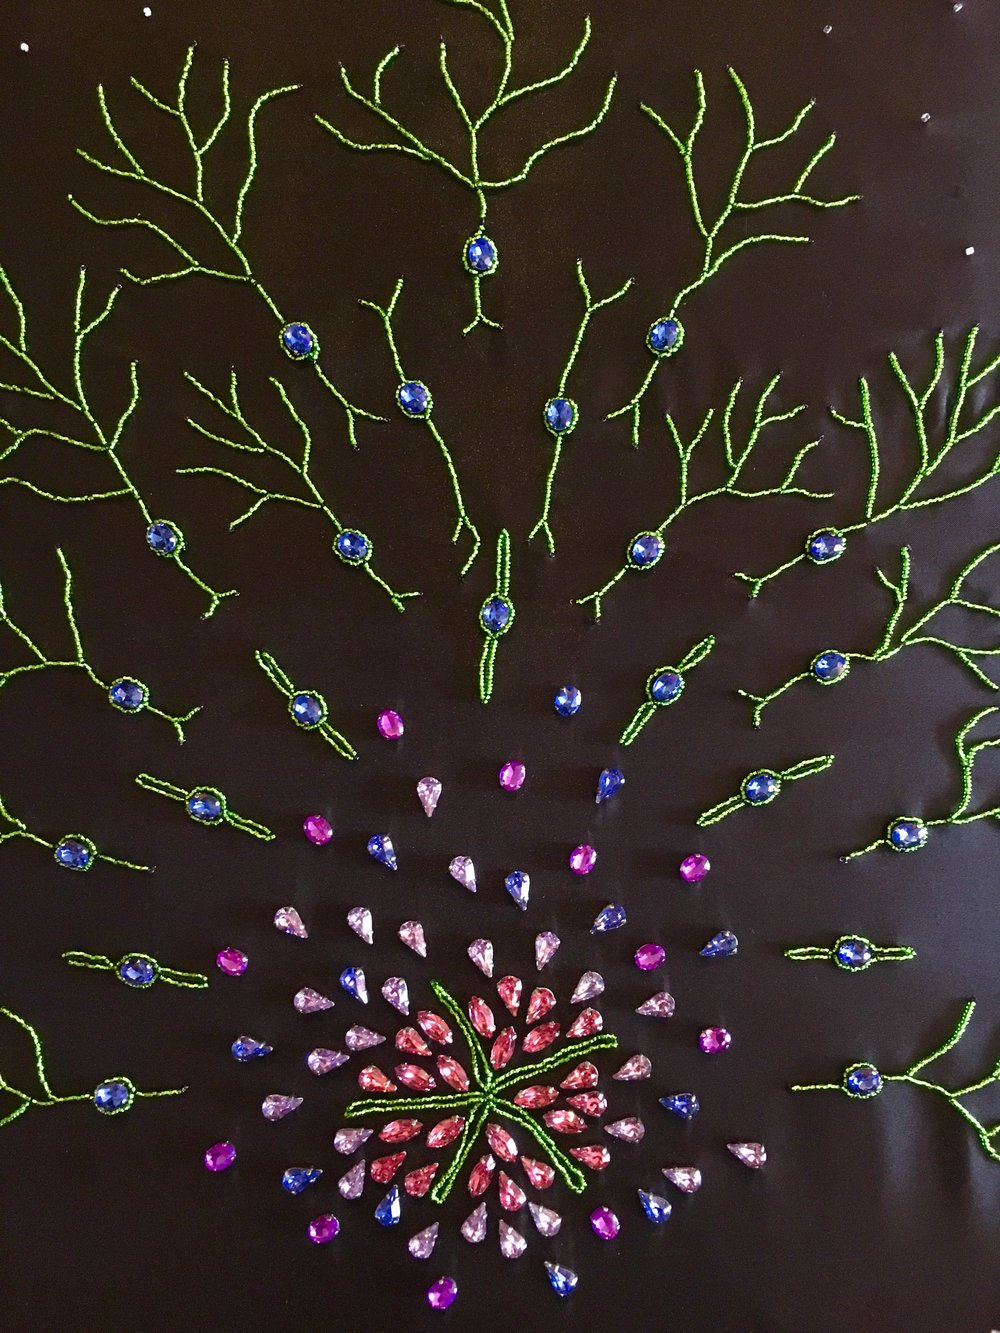 Sunrise by Yana Zorina, 2018, beads on silk